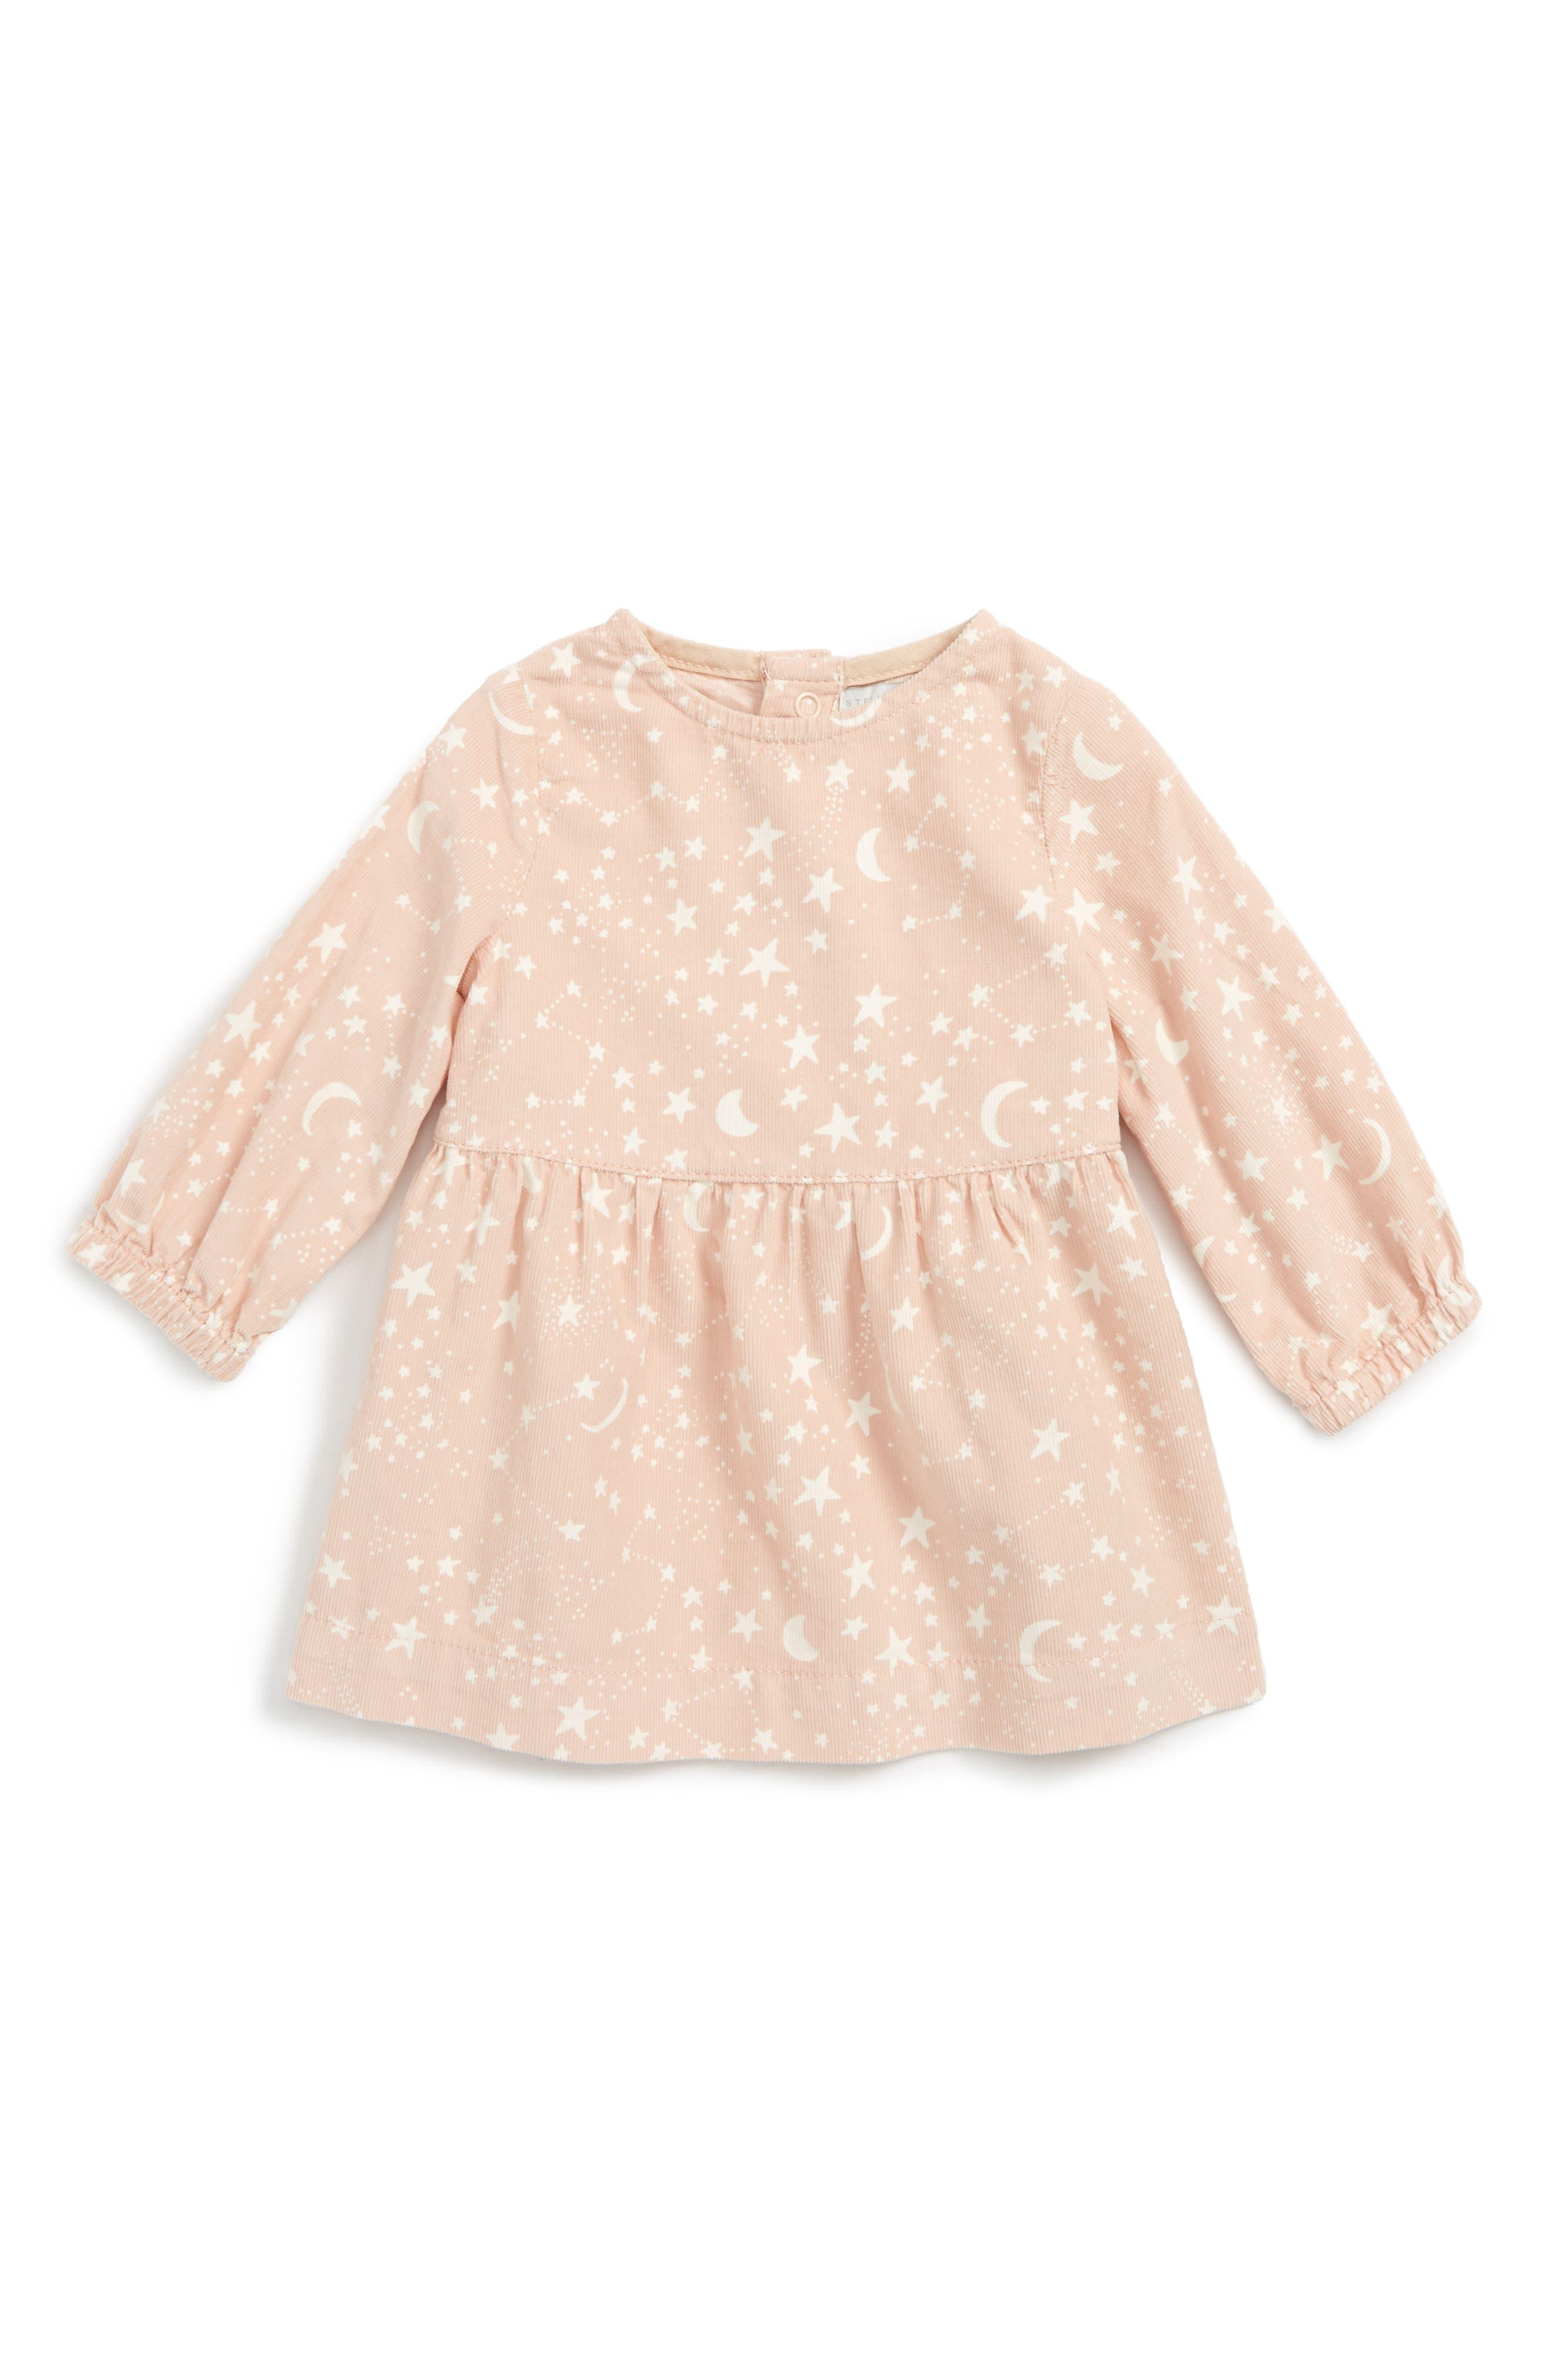 Alternate Image 1 Selected - Stella McCartney Kids Skippy Star Print Dress (Baby Girls)